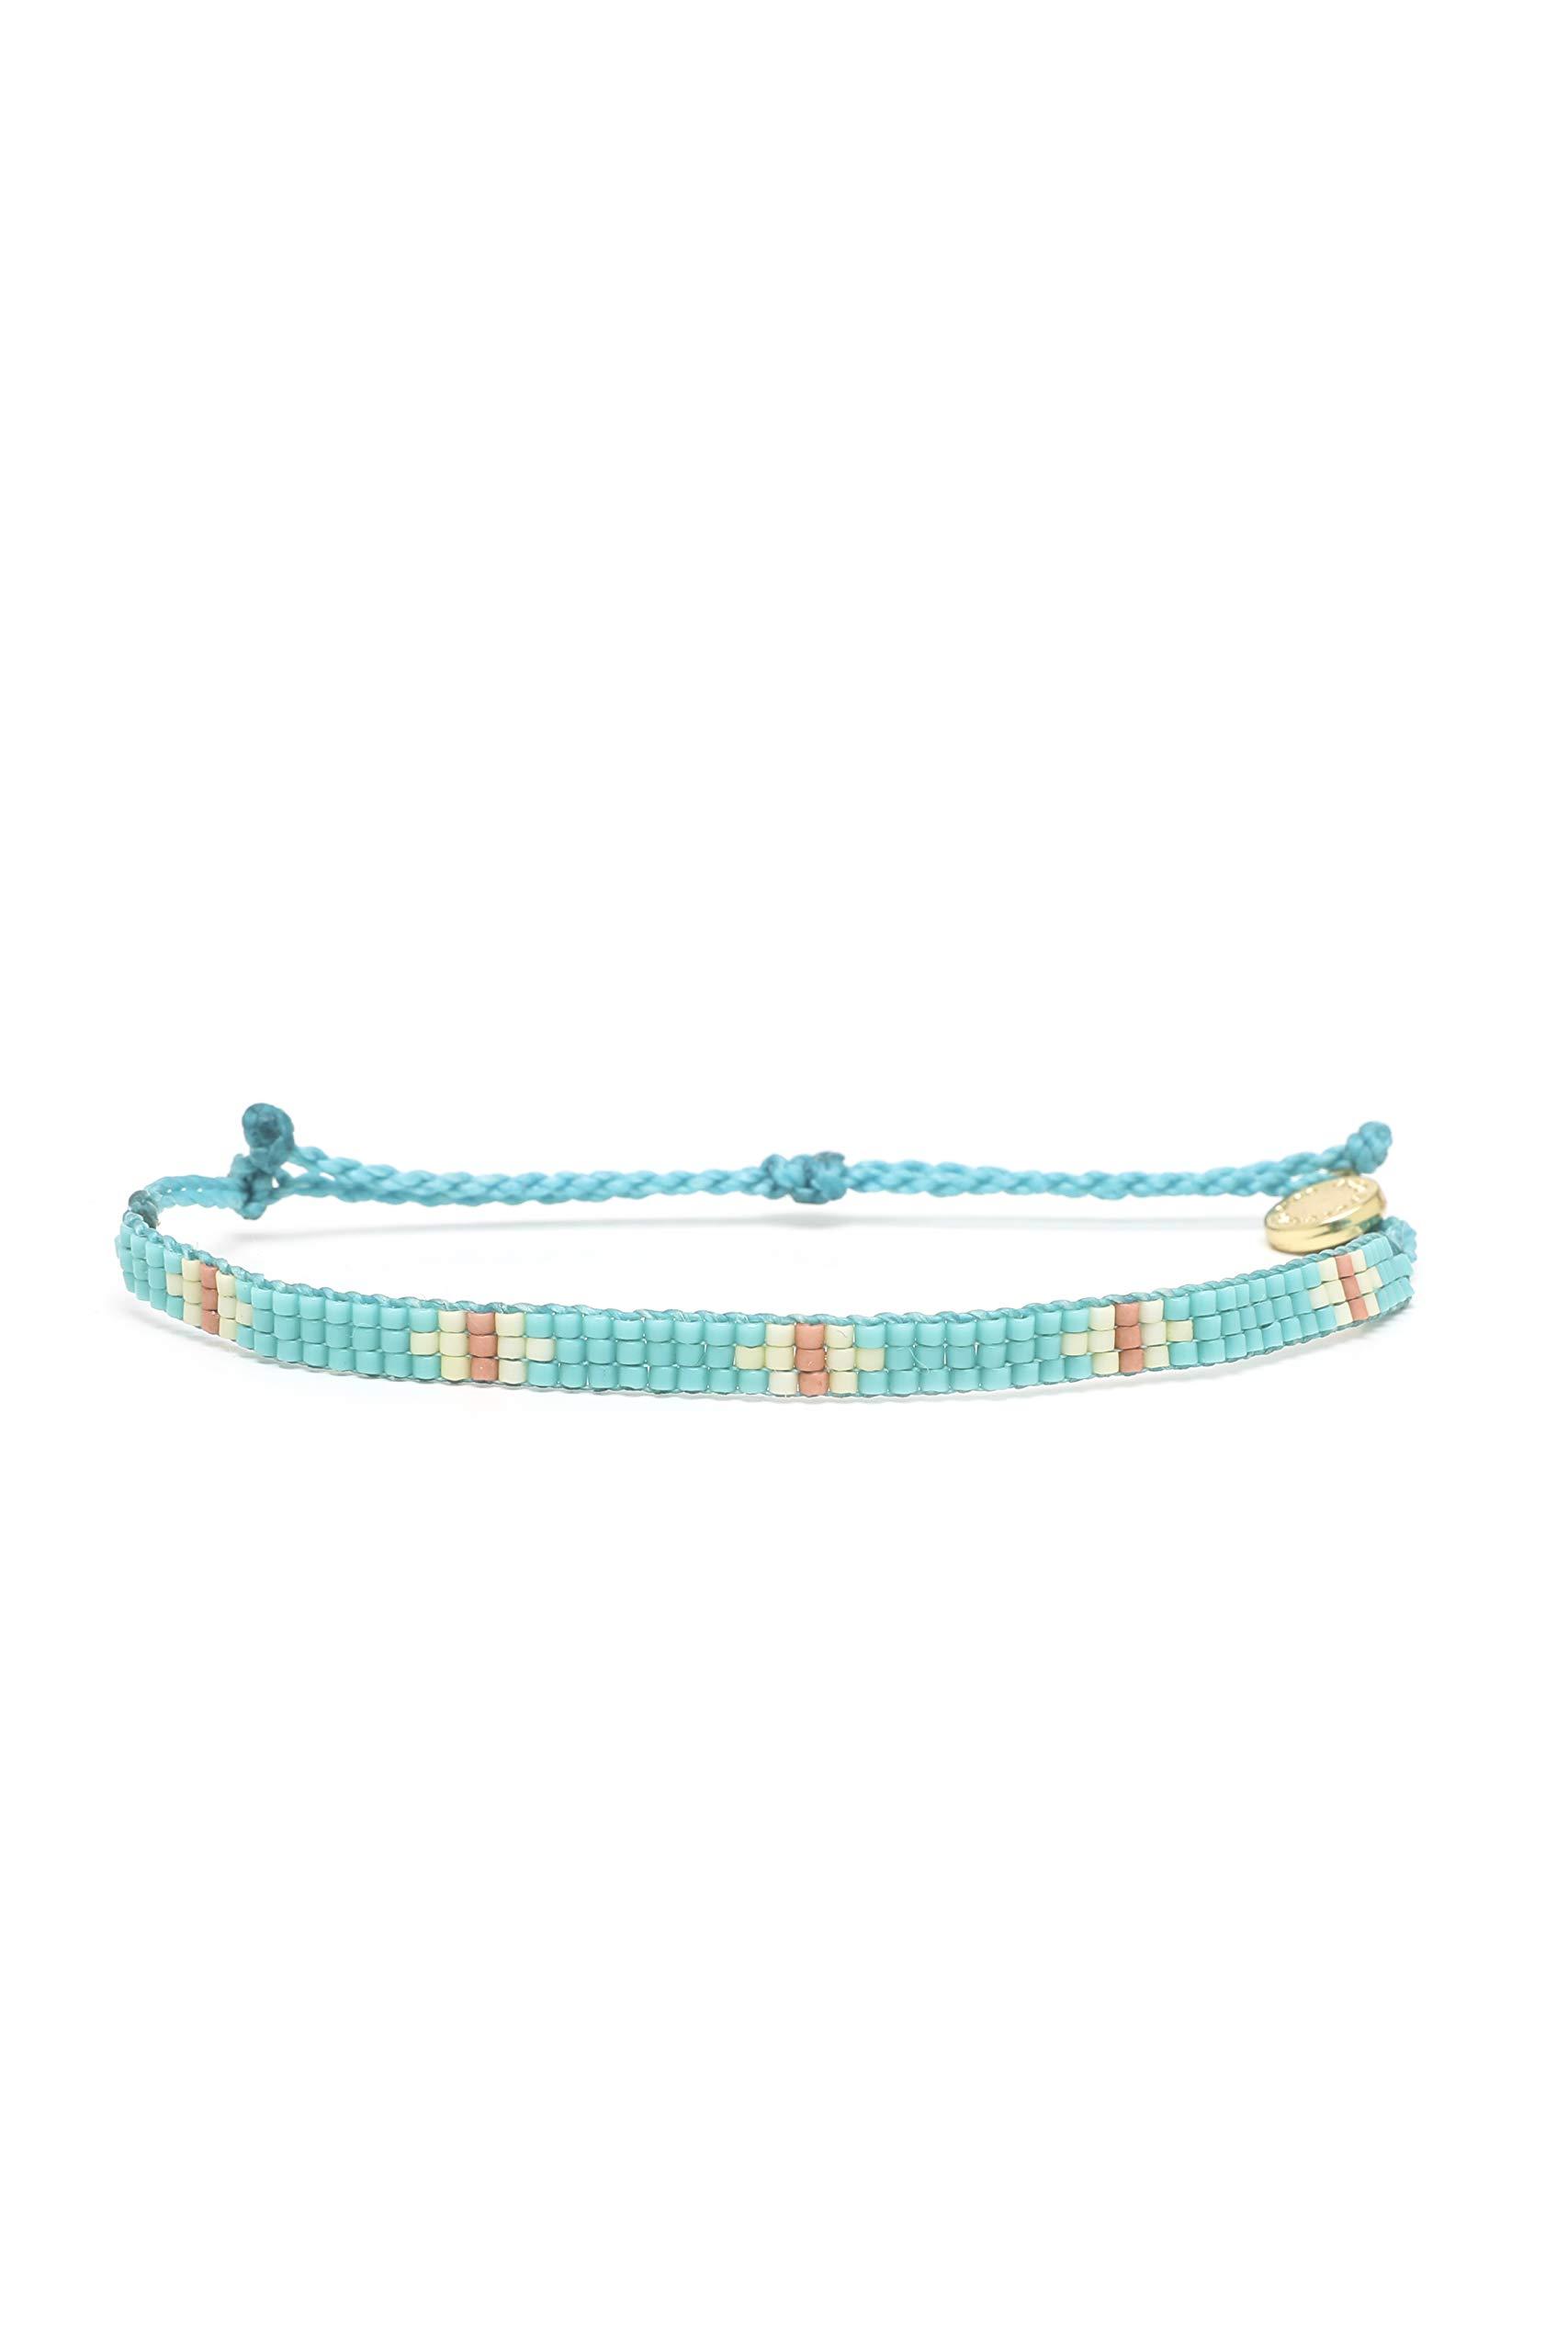 Pura Vida Flat Bead Bracelet w/Plated Charm - Adjustable Band, 100% Waterproof - Turquoise